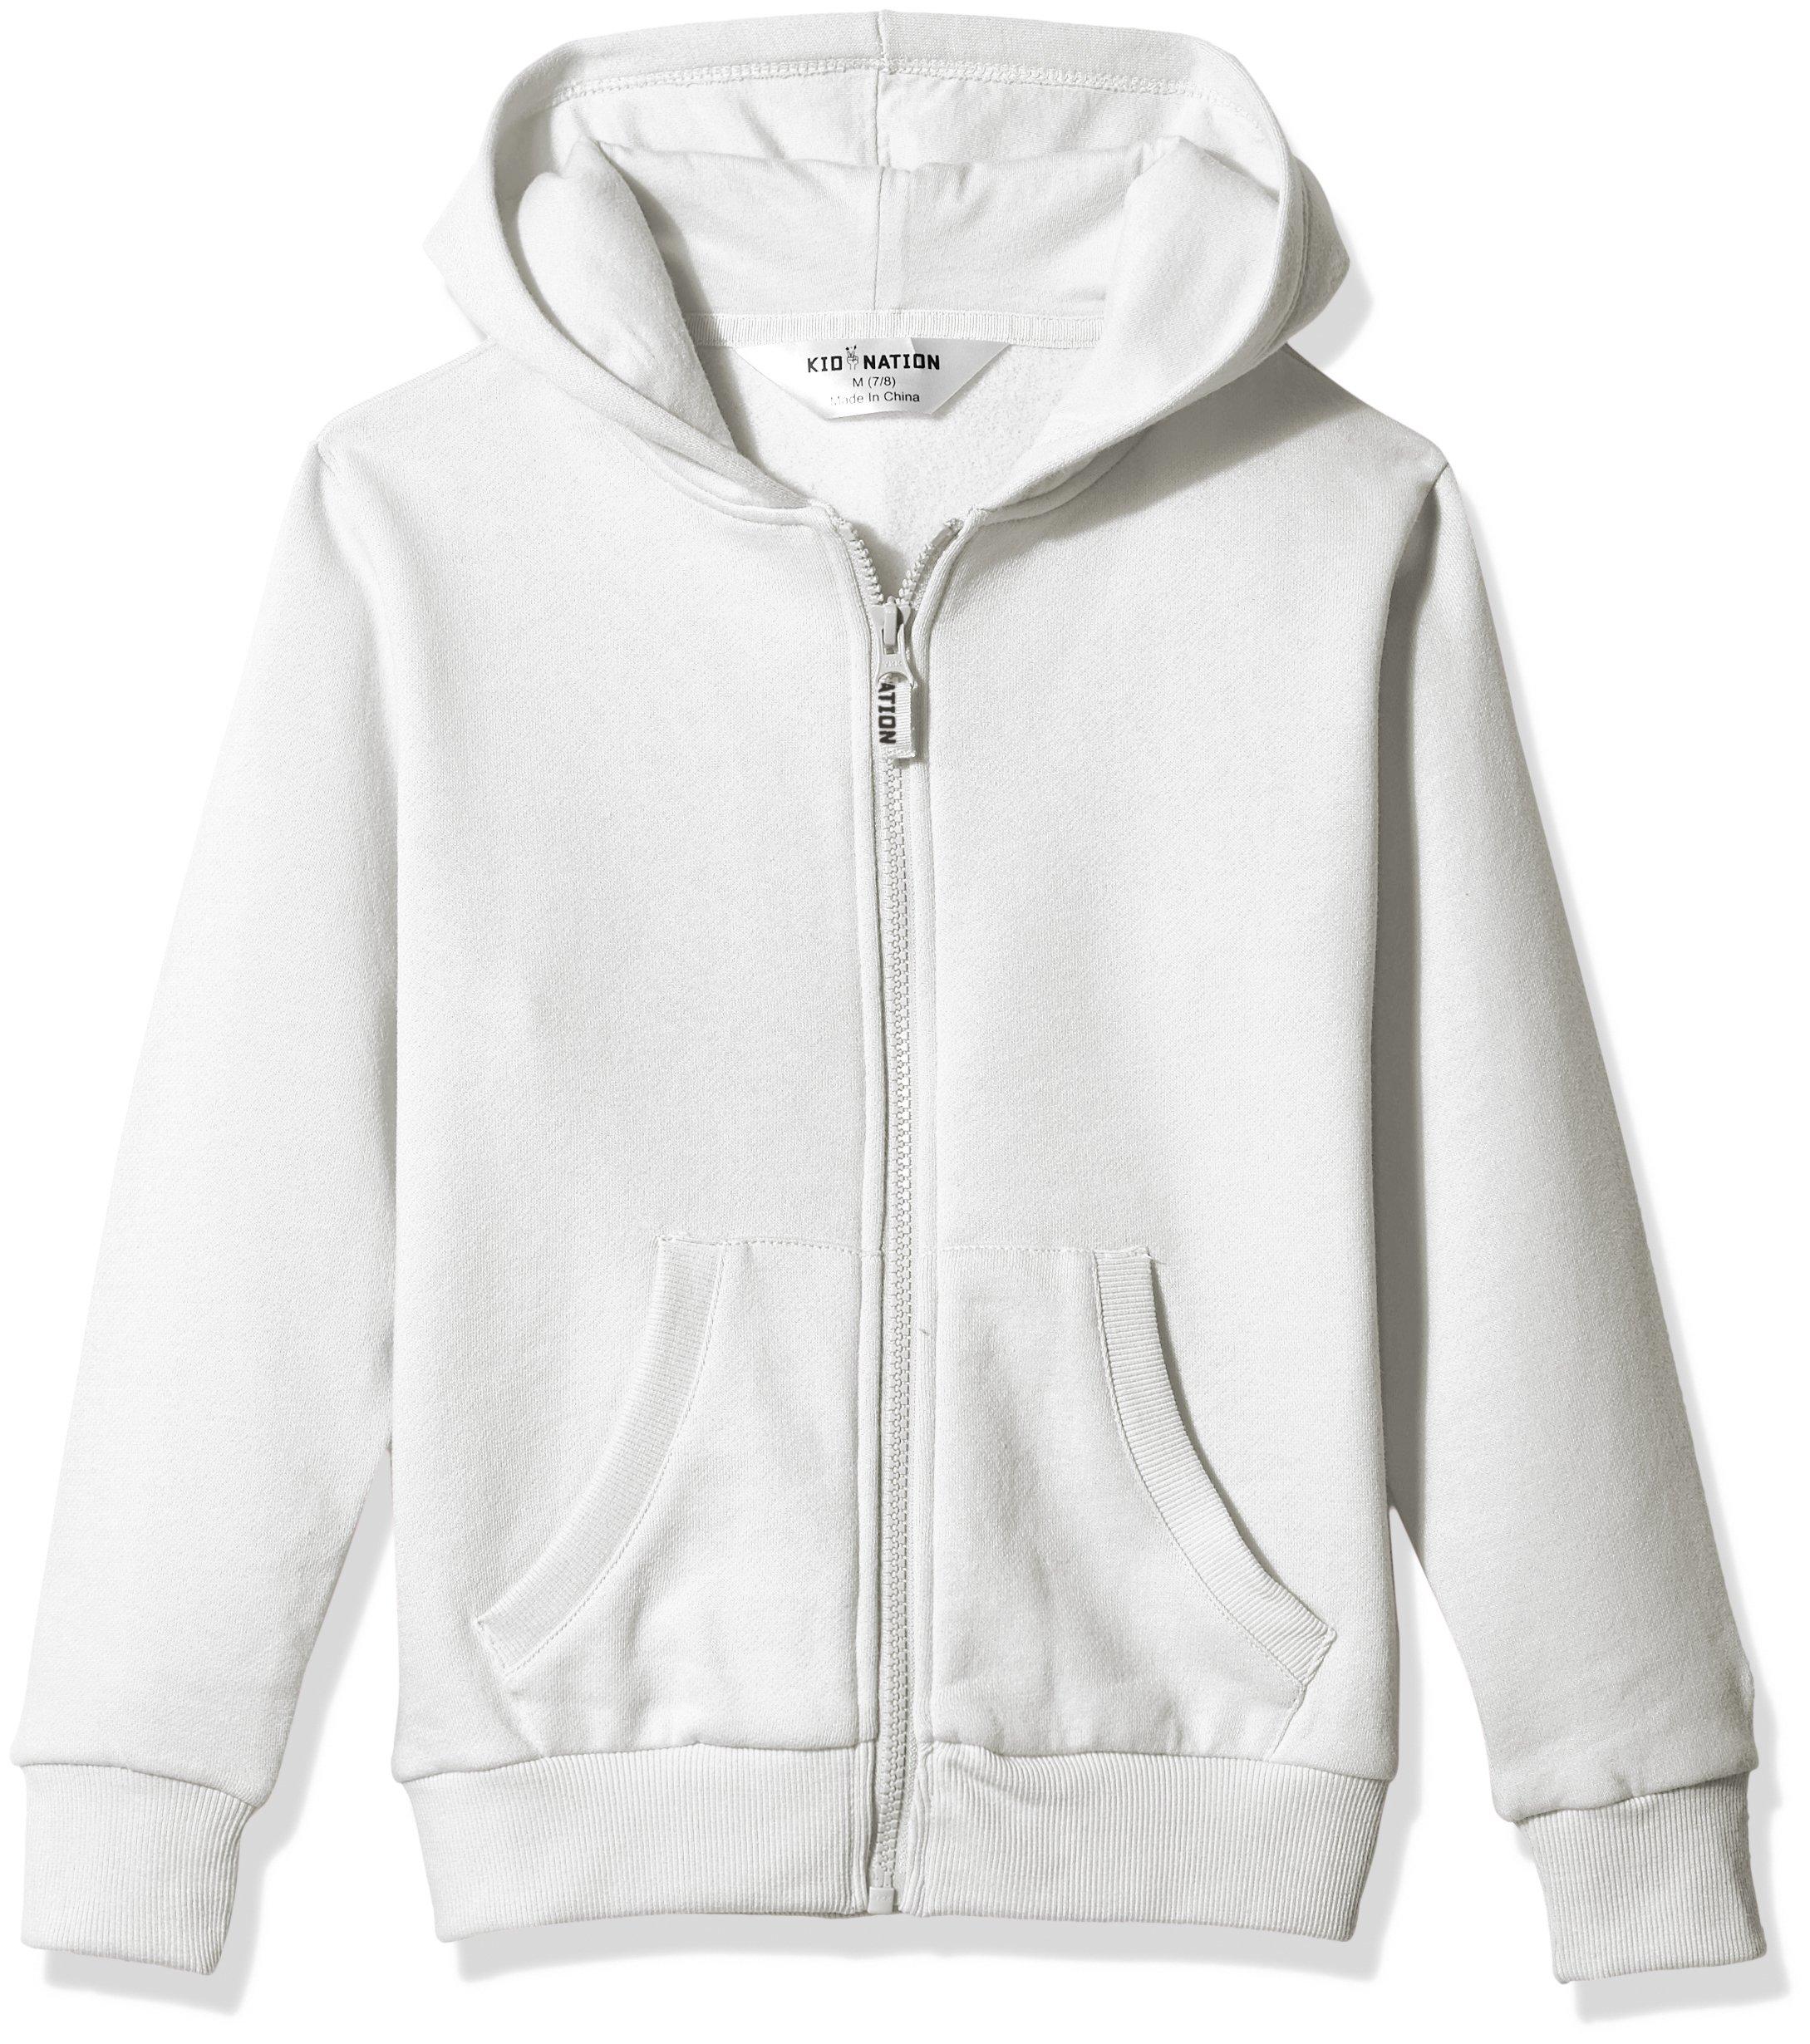 Kid Nation Kids' Brushed Fleece Zip-up Hooded Sweatshirt for Boys Girls XS White